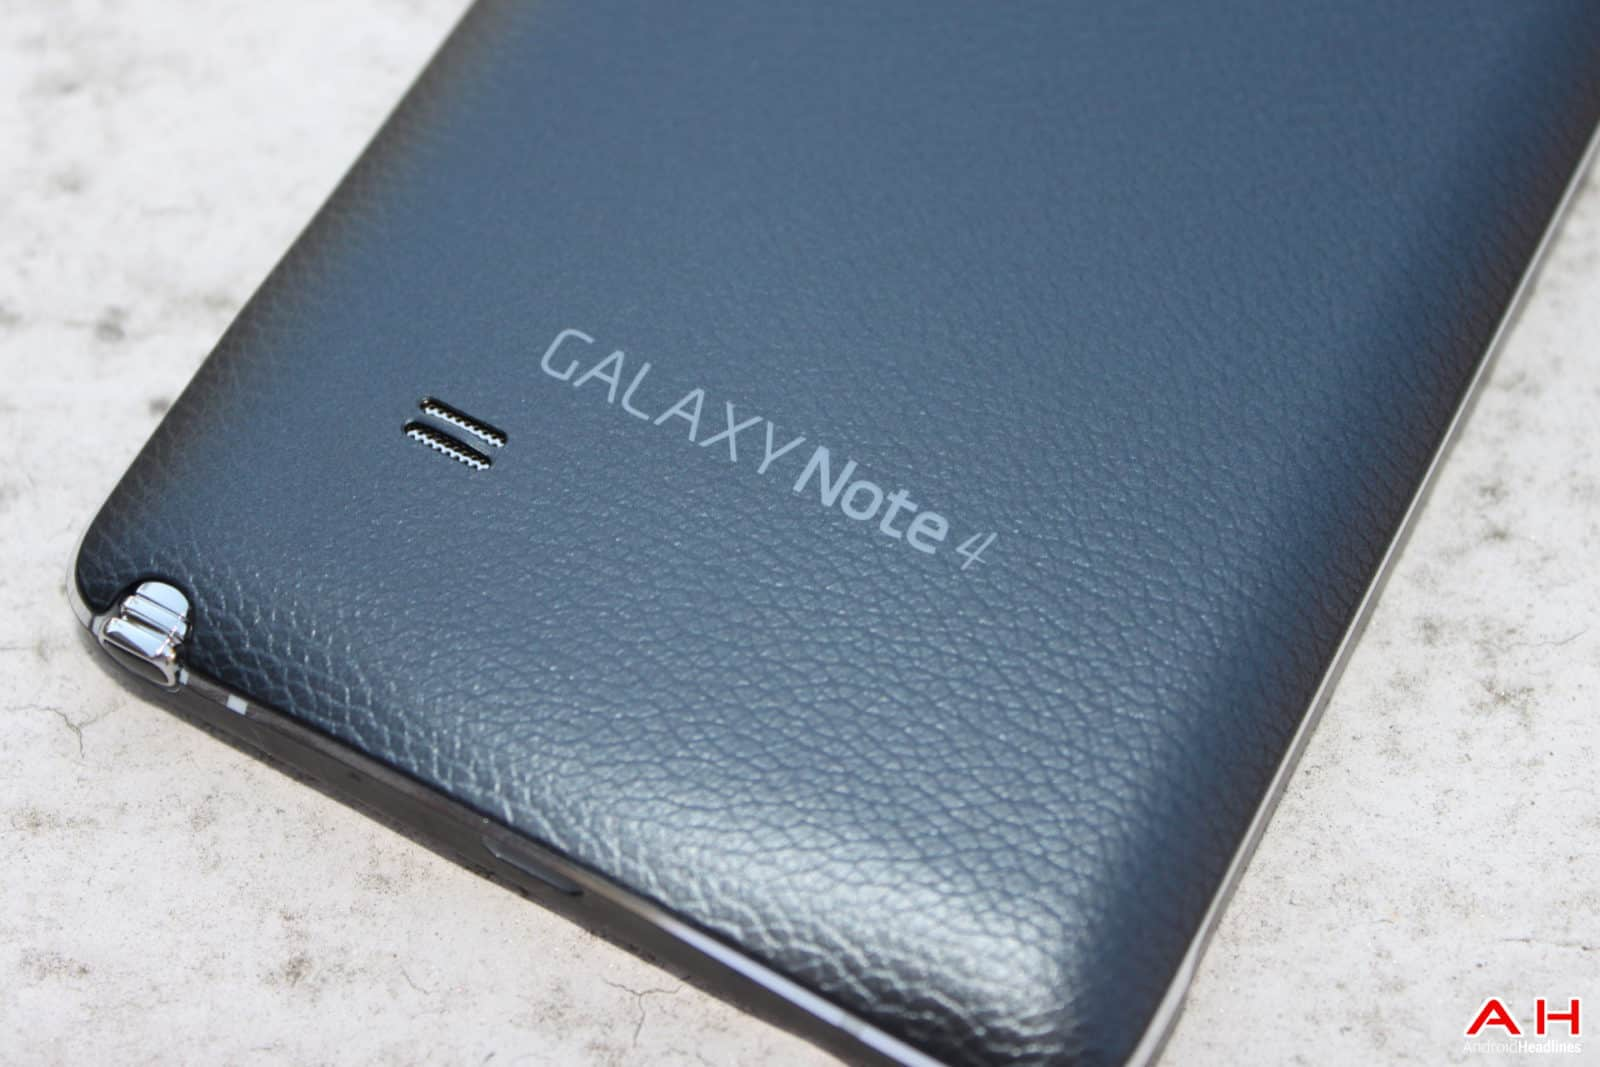 AH Samsung Galaxy Note 4-18